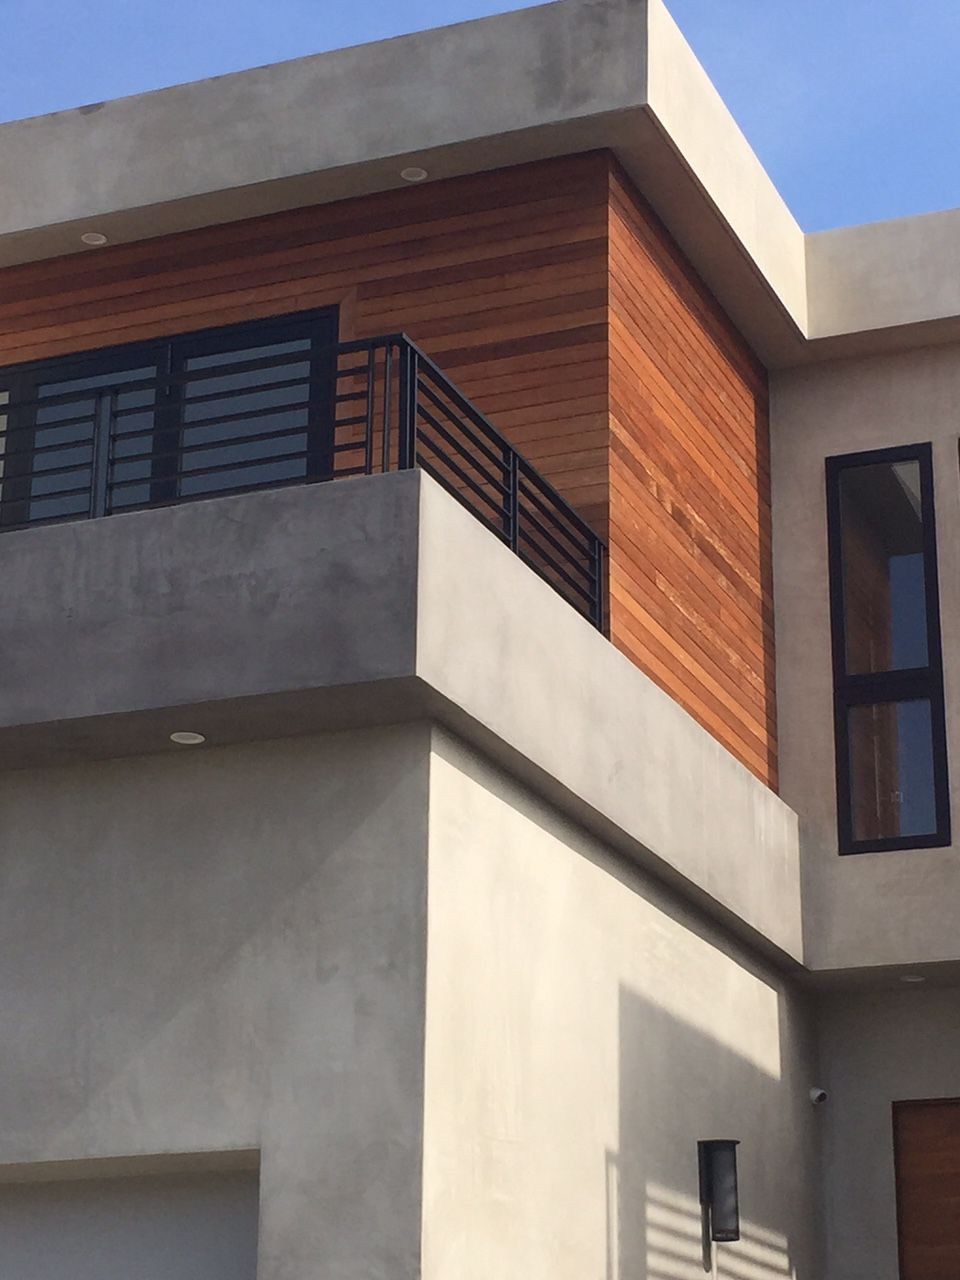 Smooth Stucco Light Grey Wood Trim Stone Exterior Houses Stucco Finishes Stucco Homes